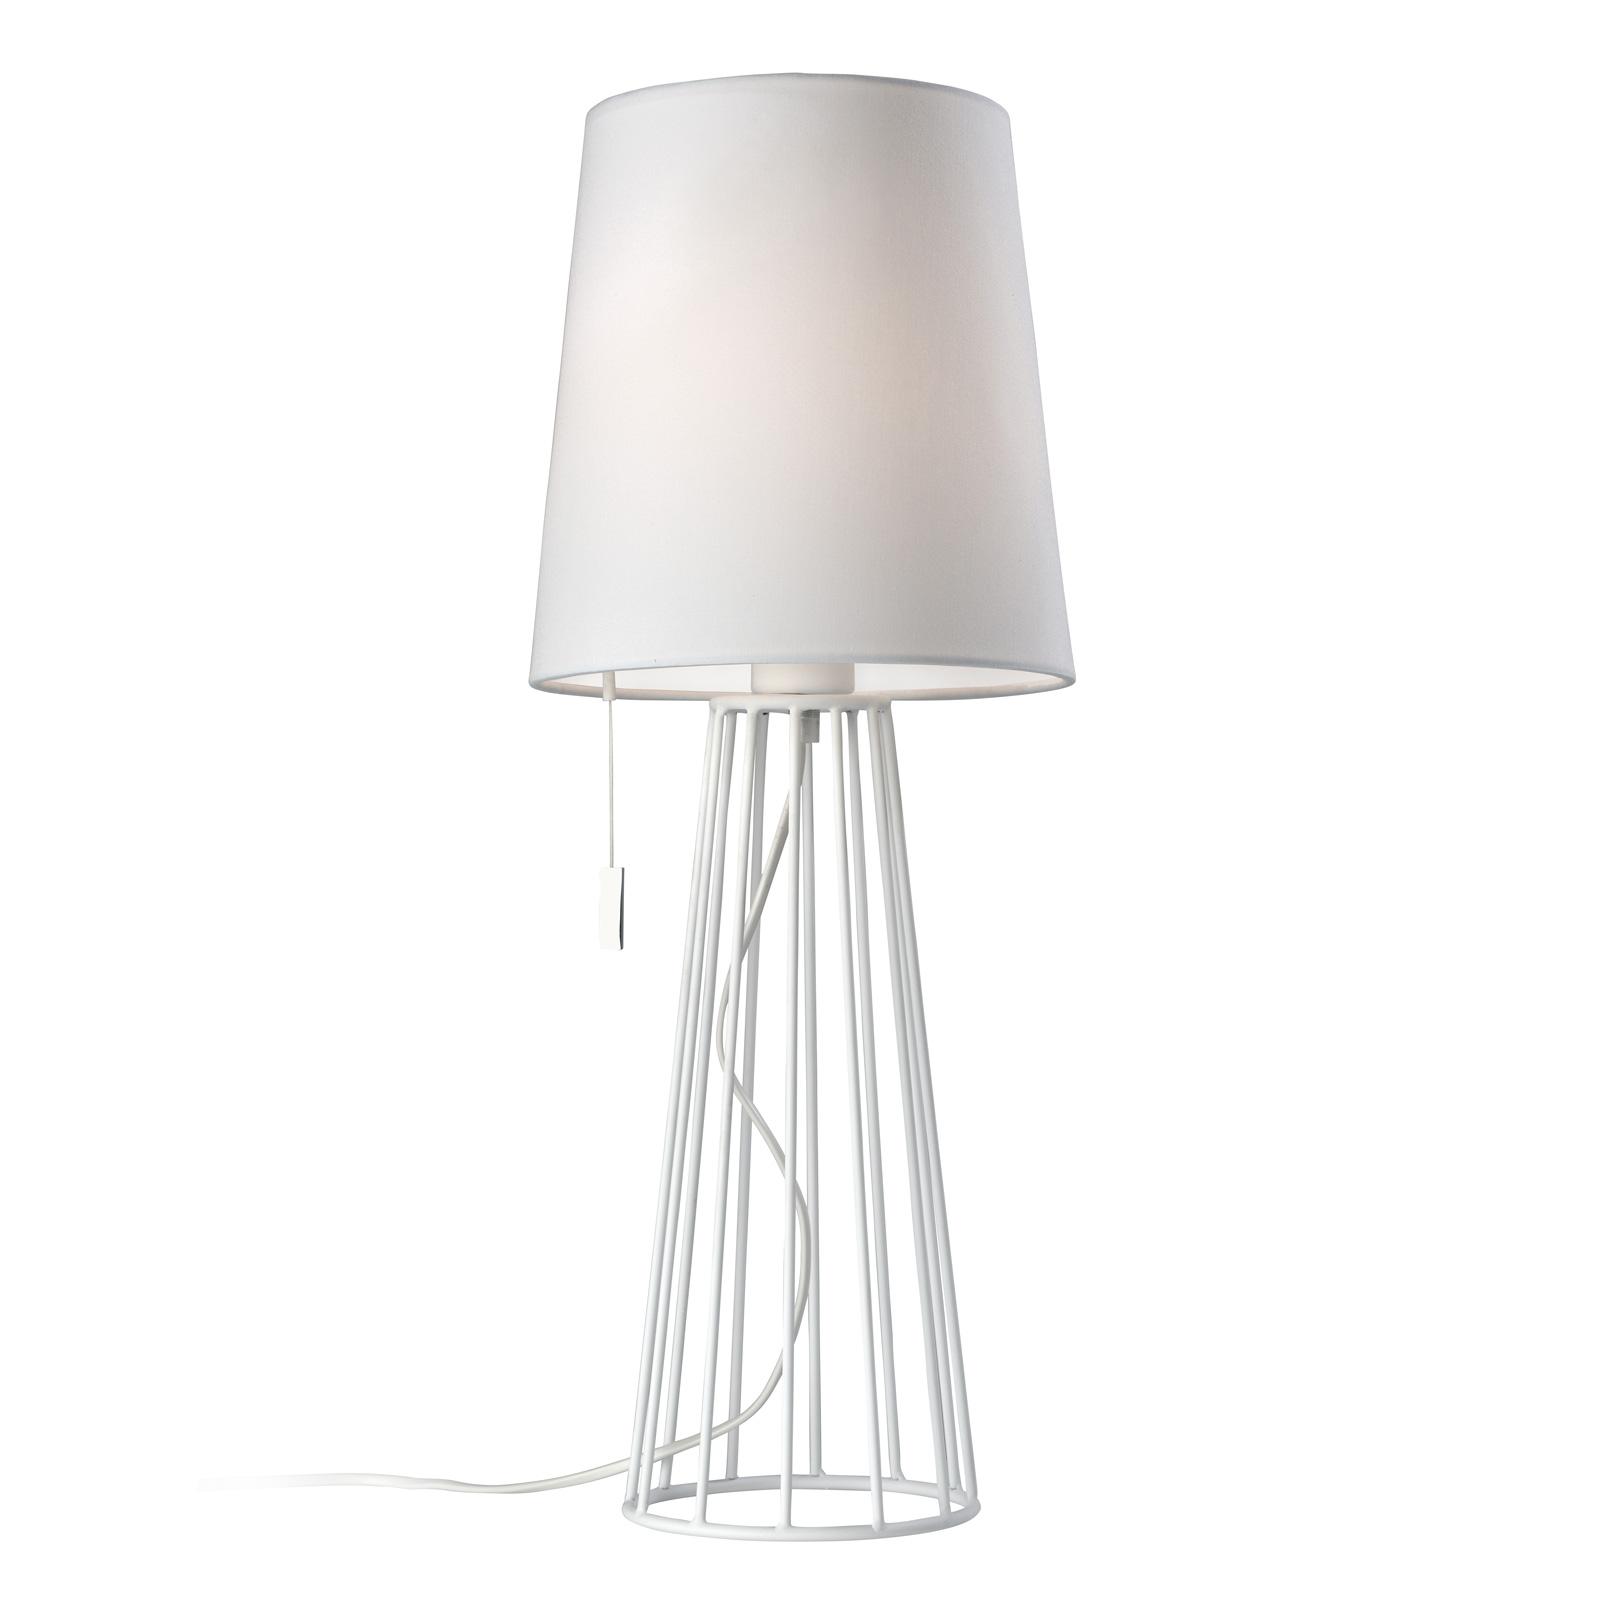 Villeroy & Boch Milan lampe à poser en blanc